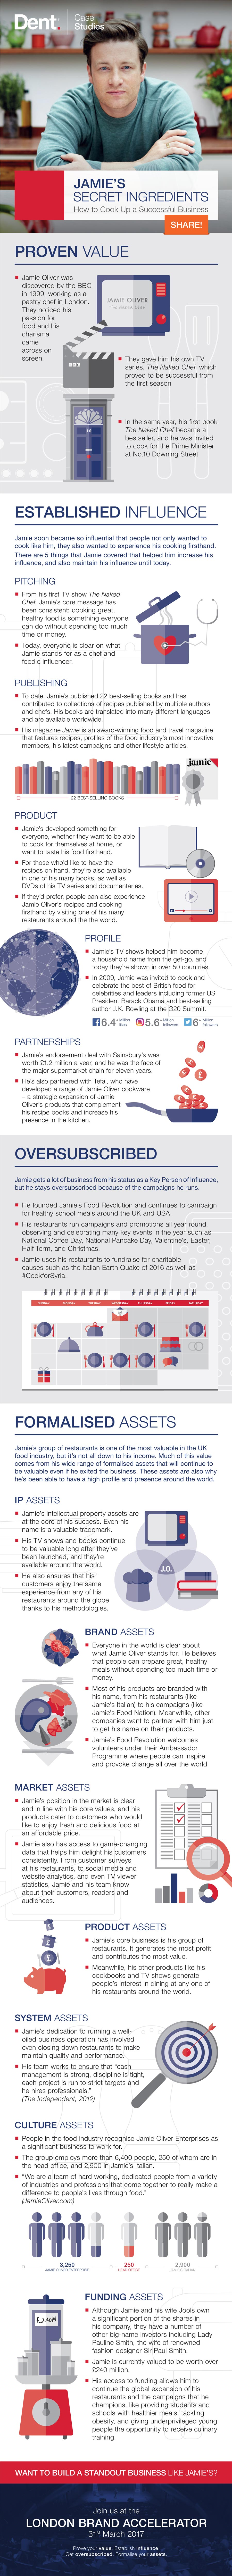 Dent | Jamie Oliver Infographic